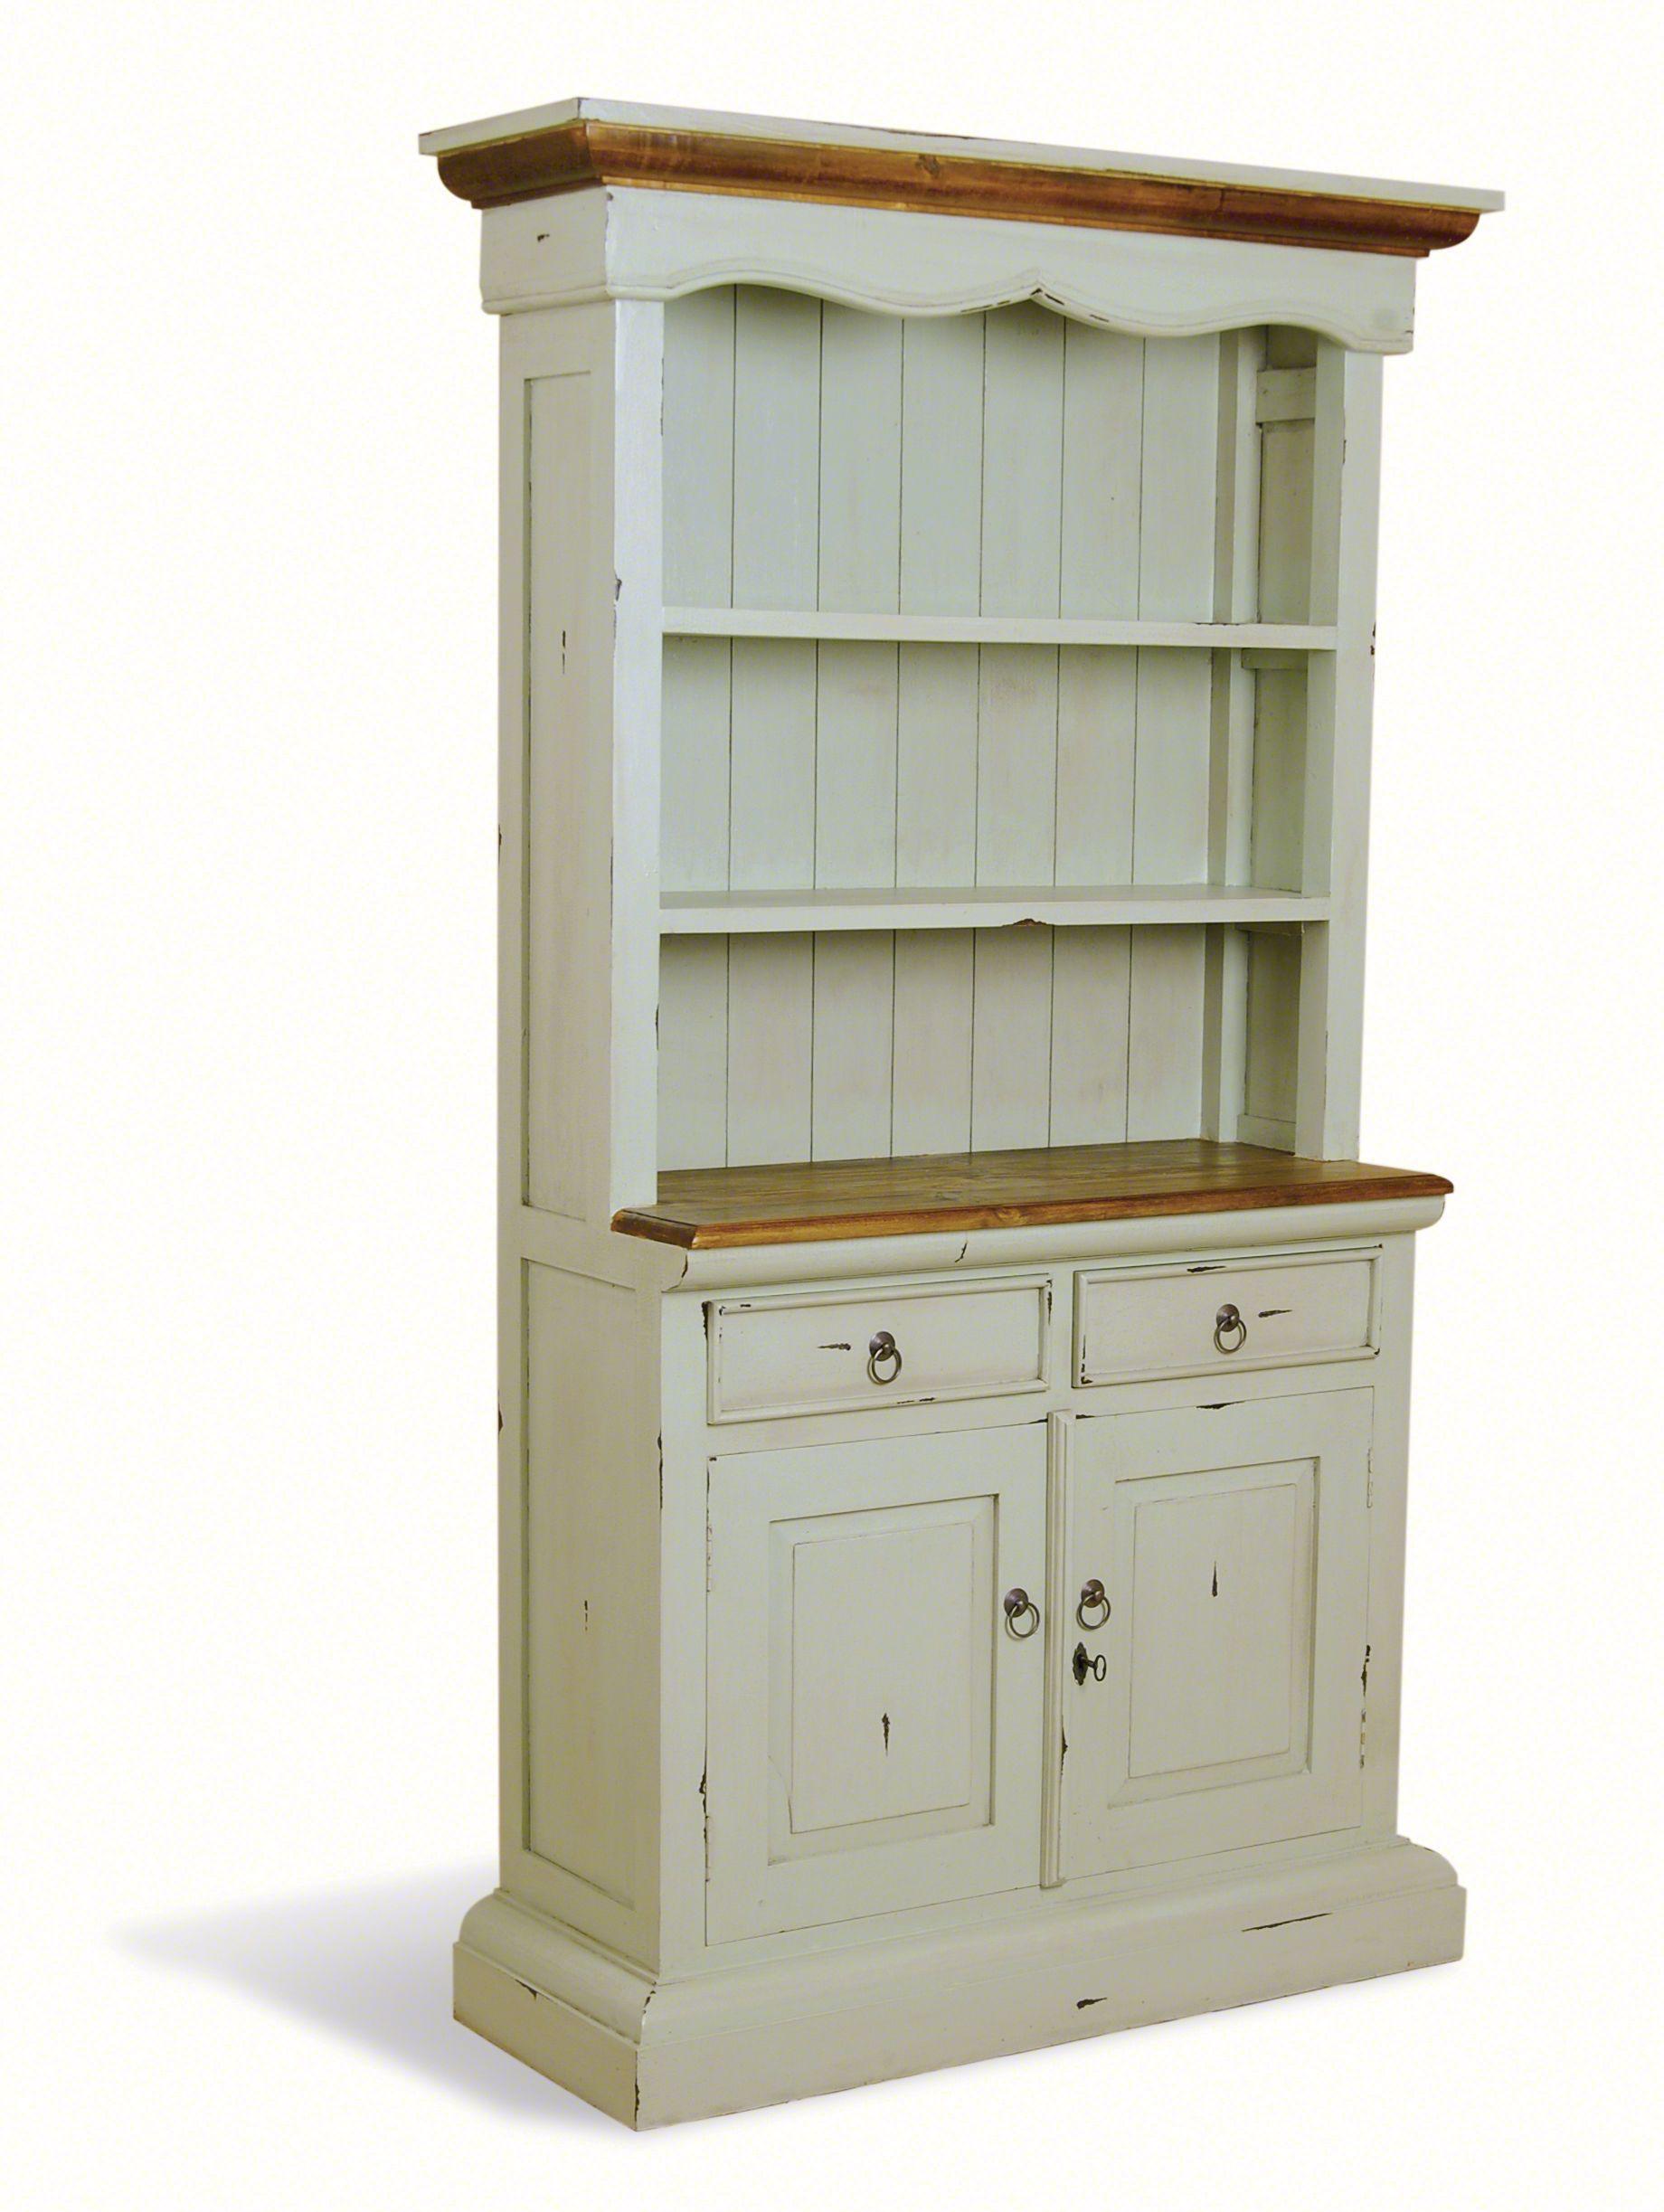 unicornman kitchen drawers unicornmanoakkitchendresserthreedrawersandthreecupboardsrais listing three auctions and oak display glazed raised dresser cupboards thumb